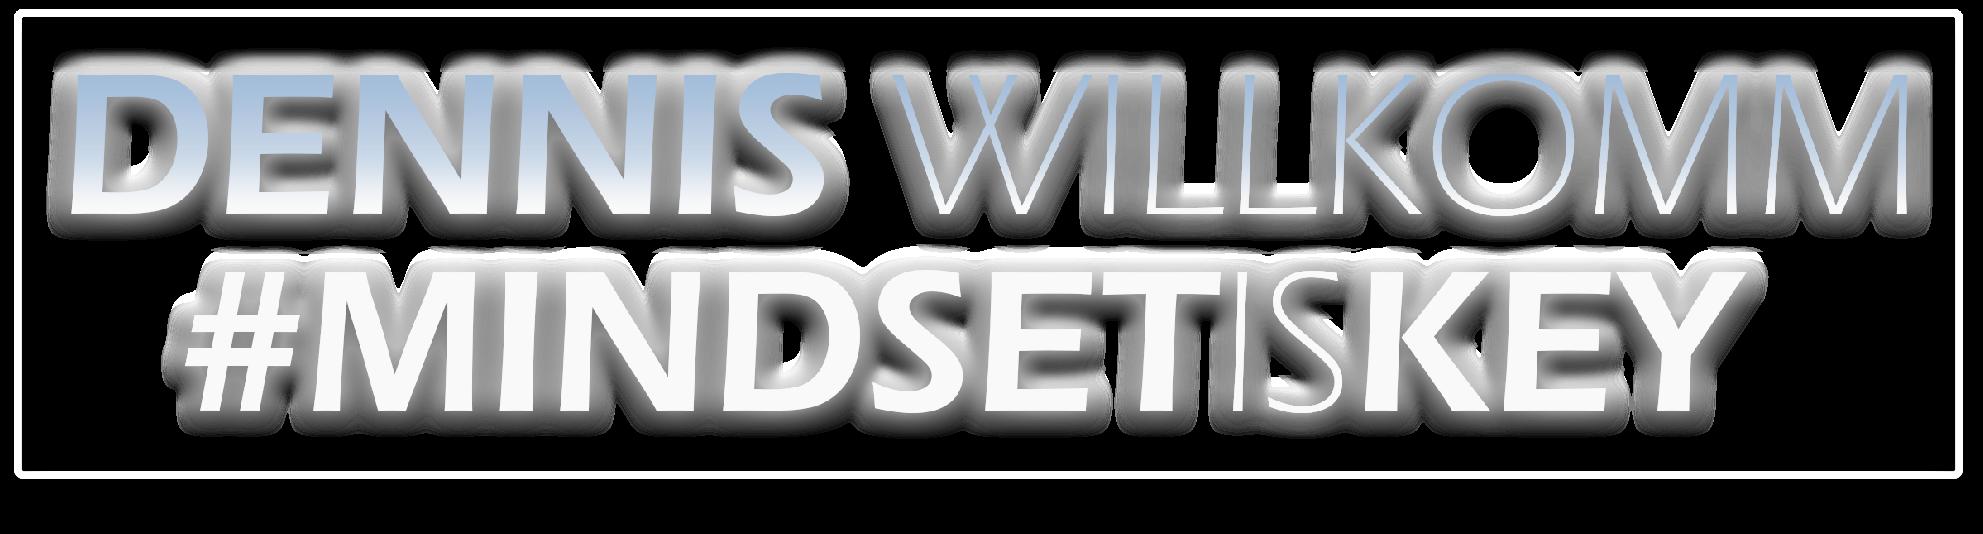 Dennis Willkomm #MindsetIsKey